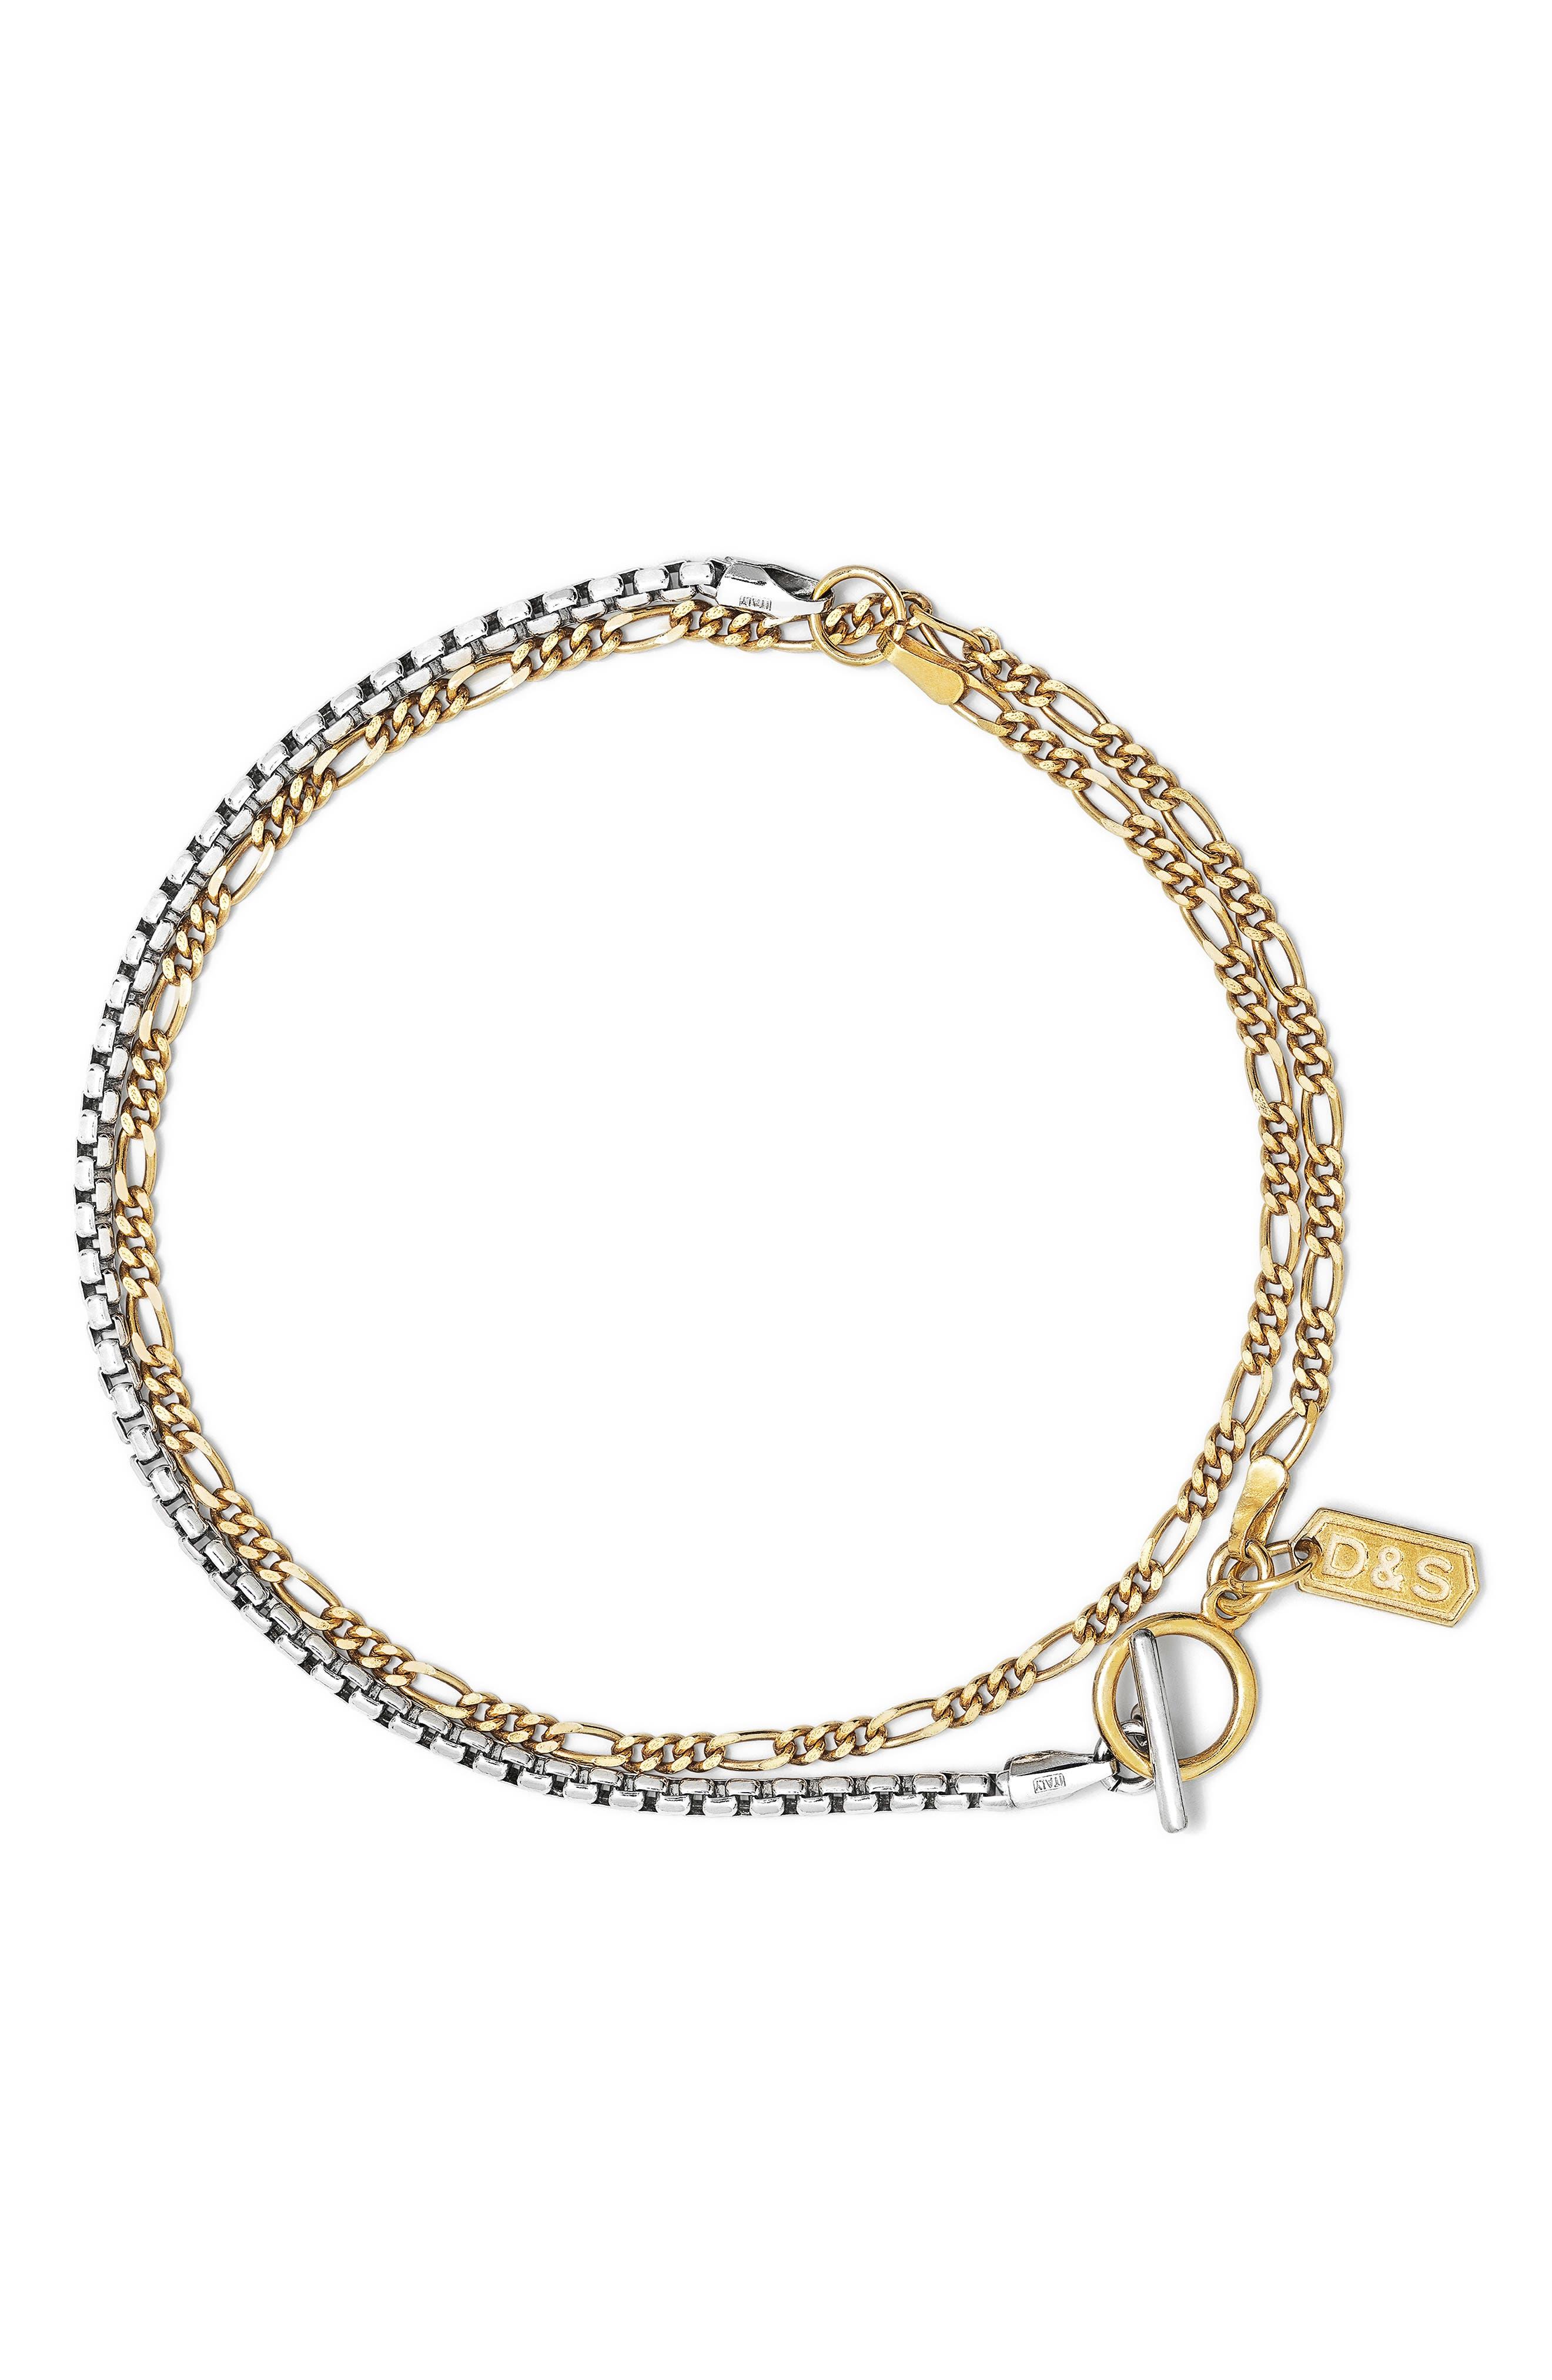 Men's Layered Chain Bracelet